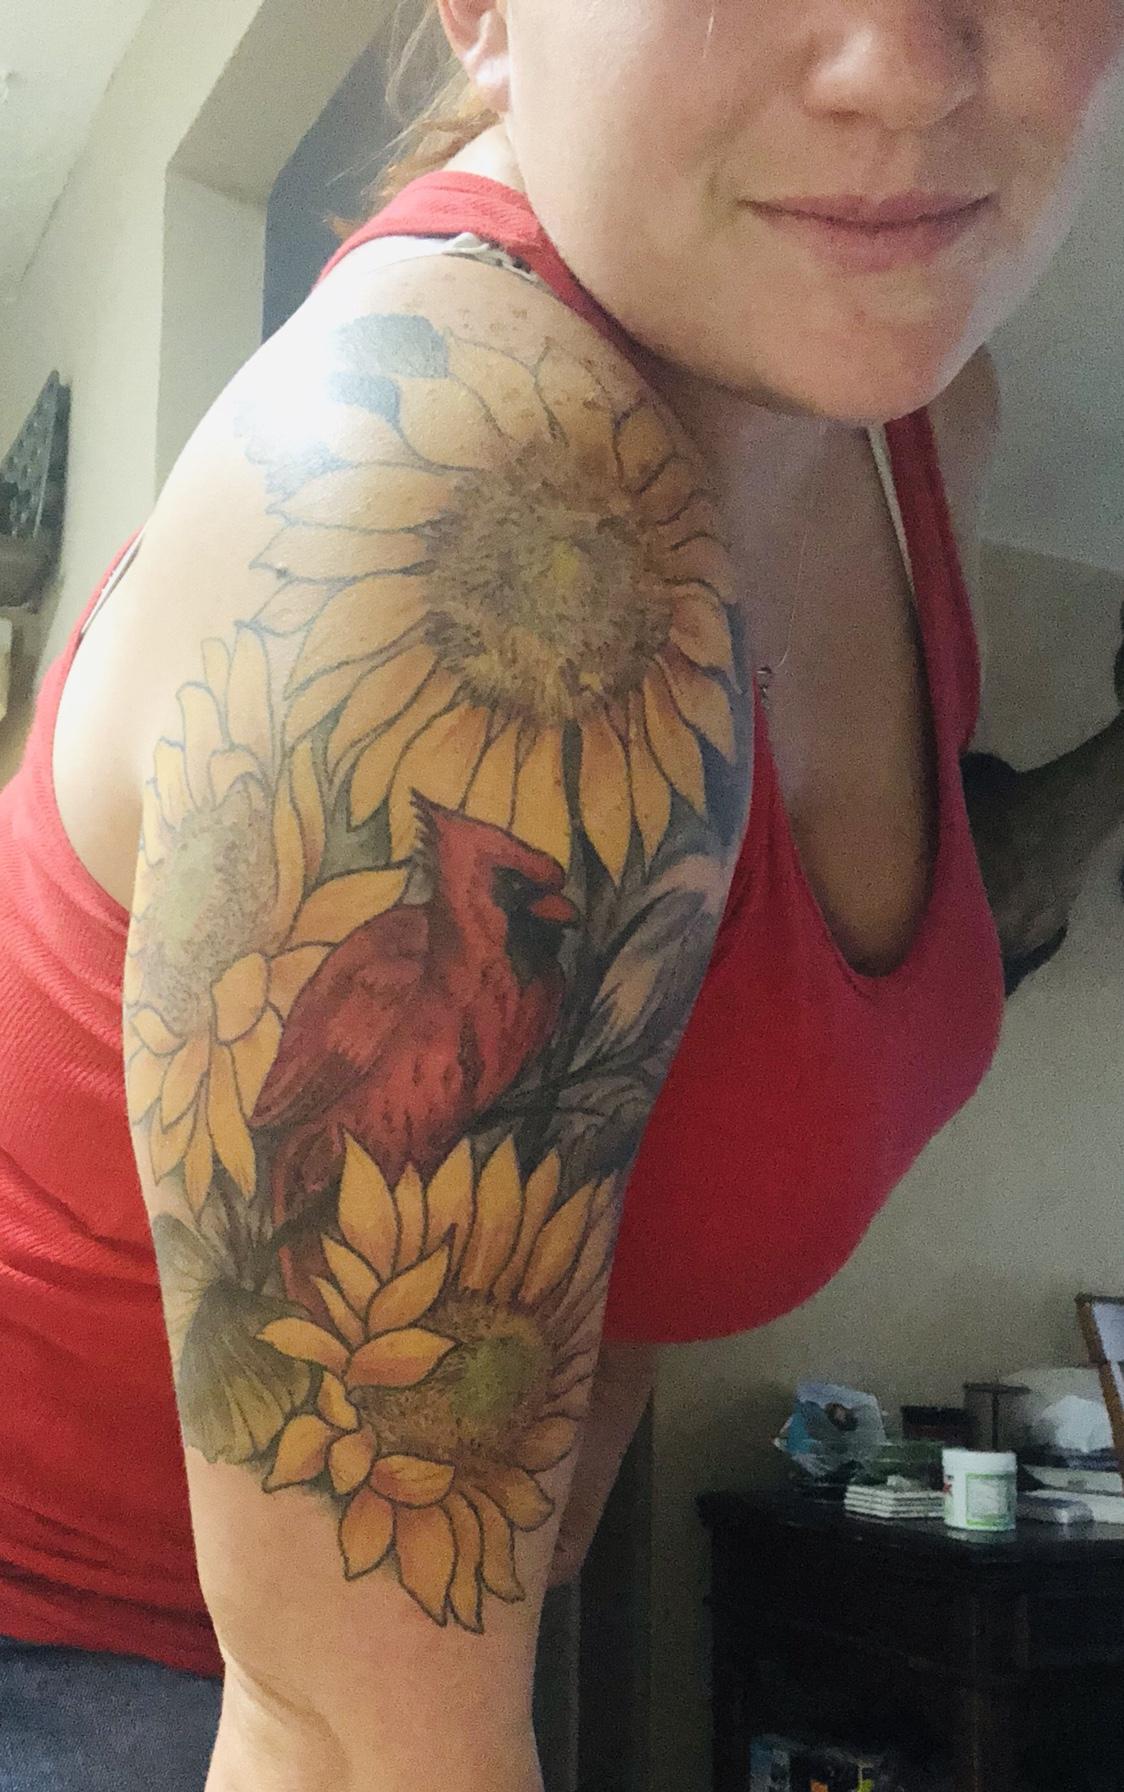 f7026f35e Full sleeve tattoo filler ideas. - TexasBowhunter.com Community ...